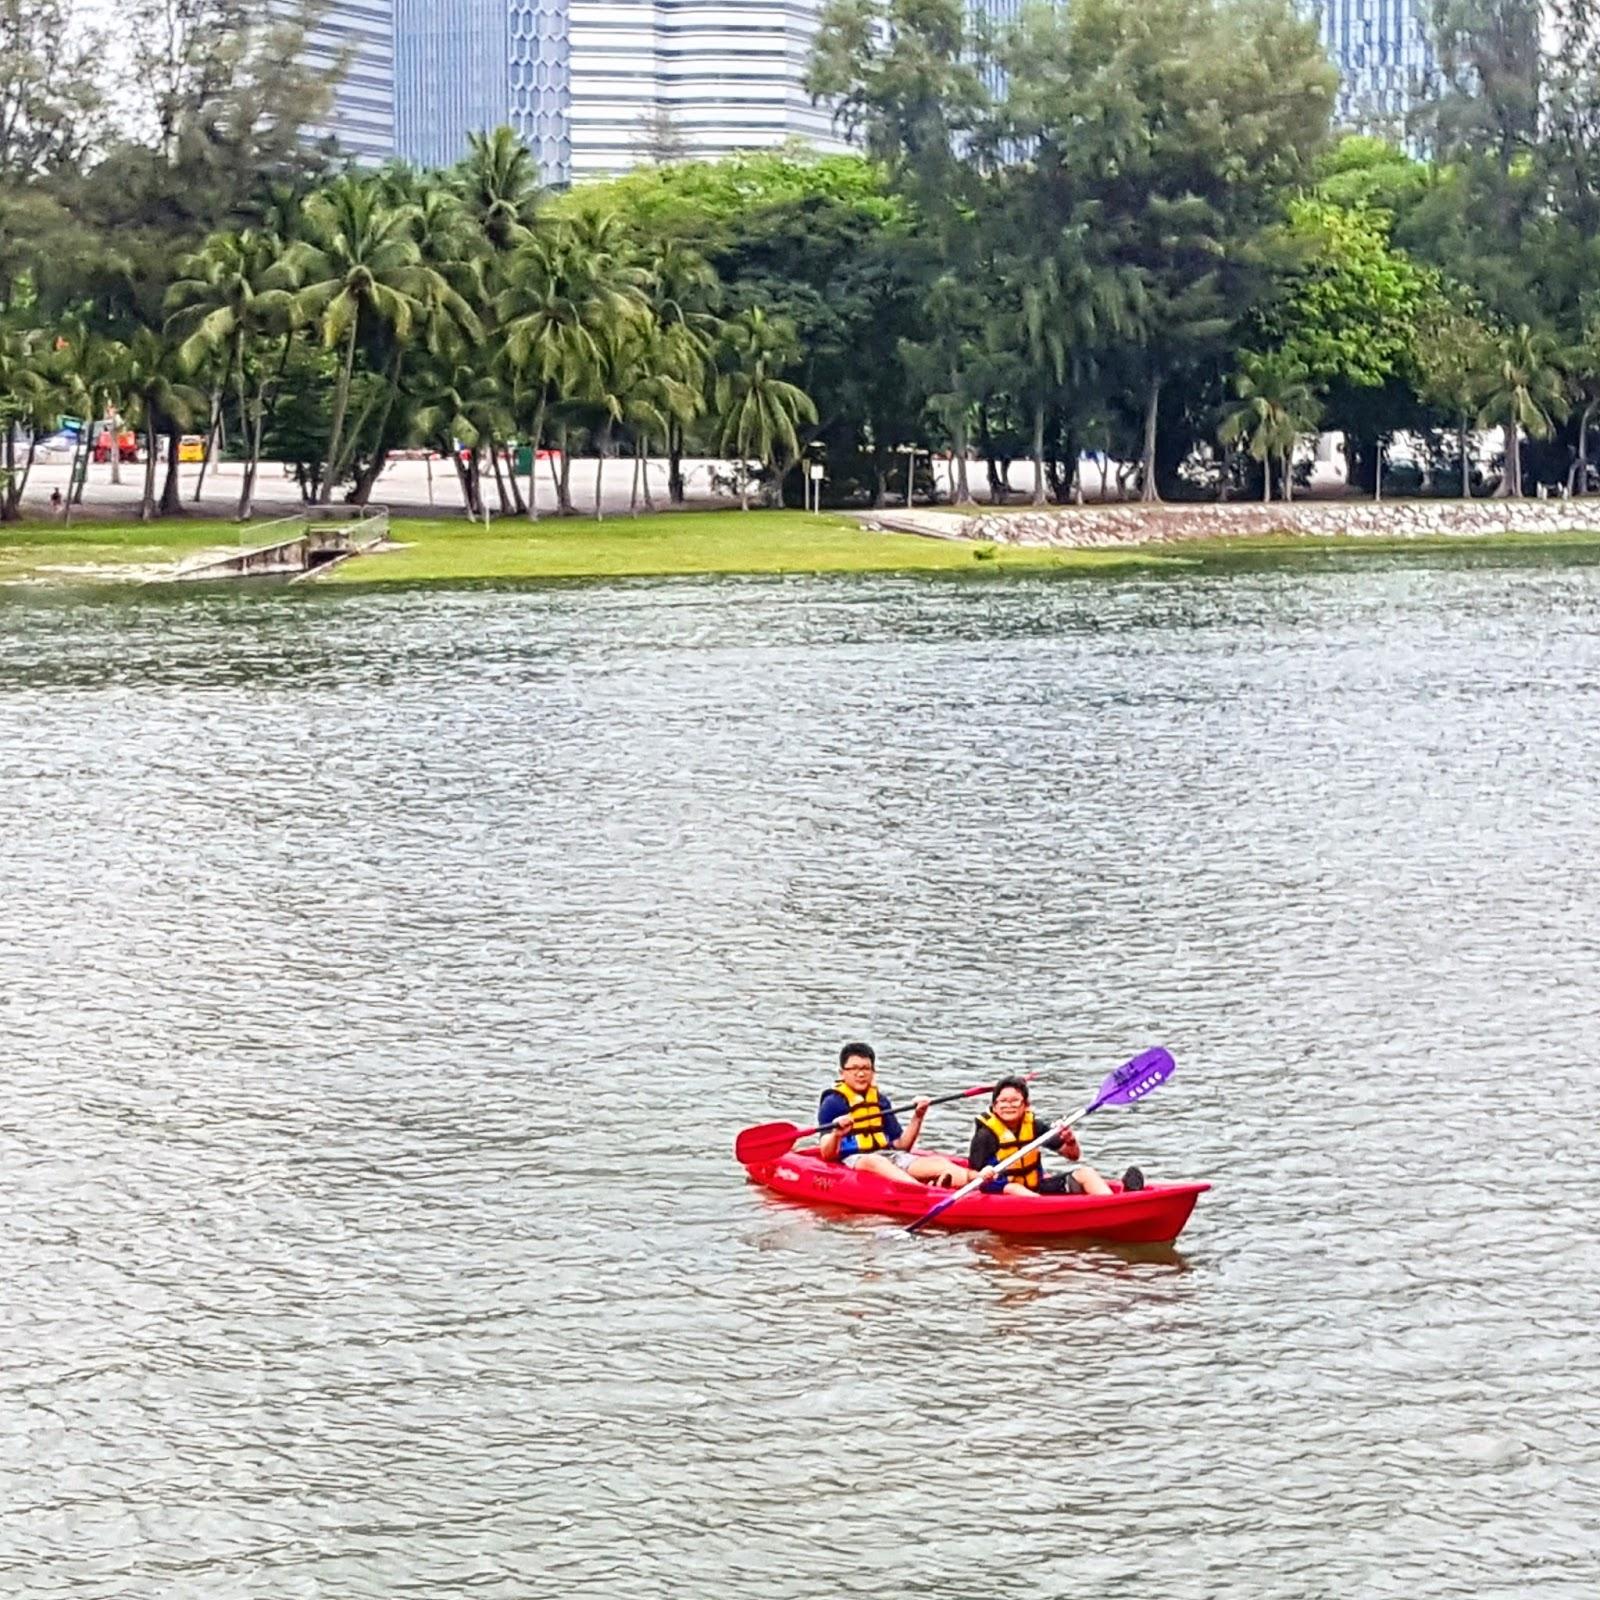 Denver Kayaking: The HENG Family Travel & Lifestyle Blog: Kayaking And